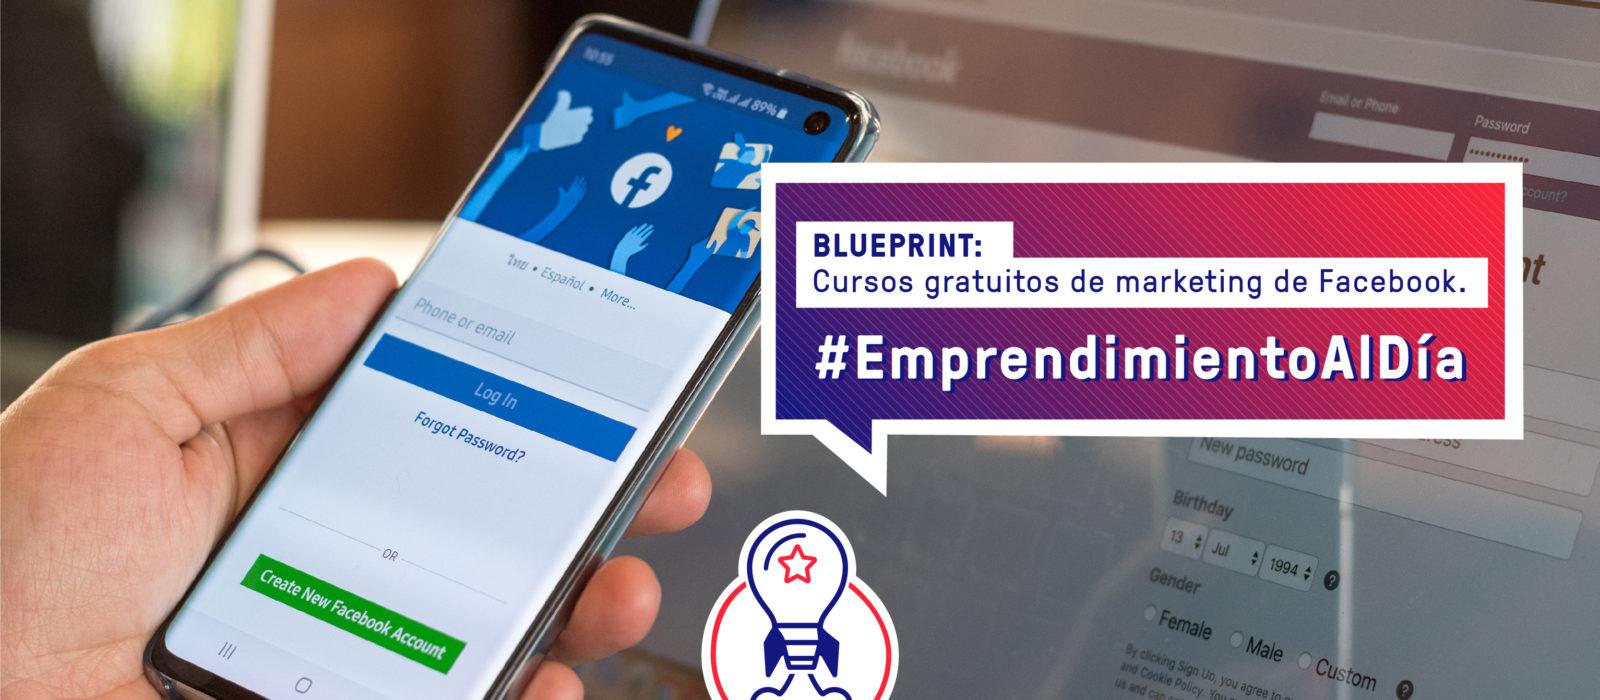 Blueprint: cursos gratuitos de marketing que ofrece Facebook